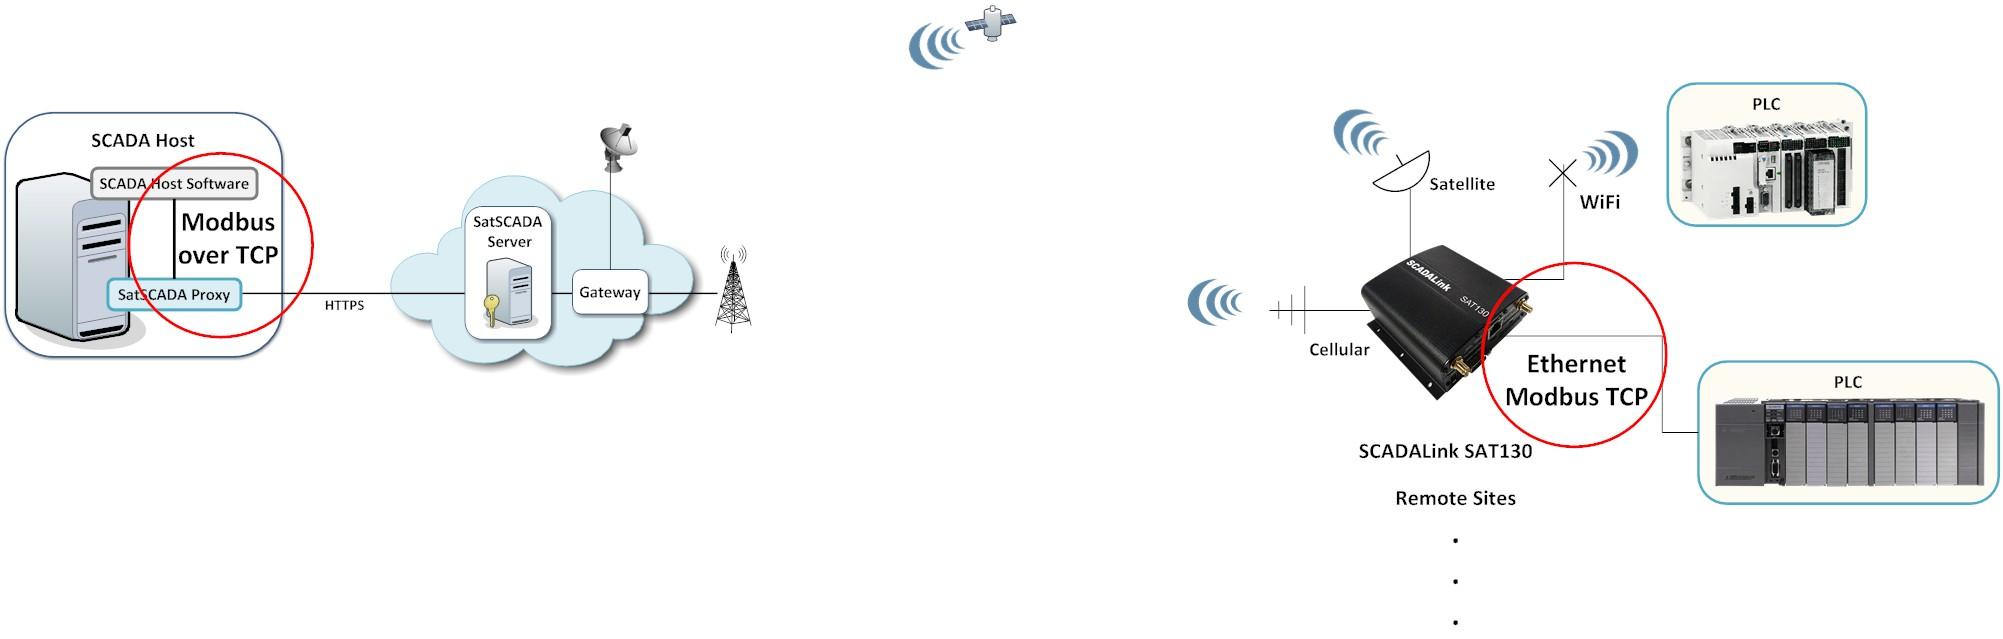 SCADALink SAT130 — Modbus TCP Satellite Connectivity to PLC/RTU Systems